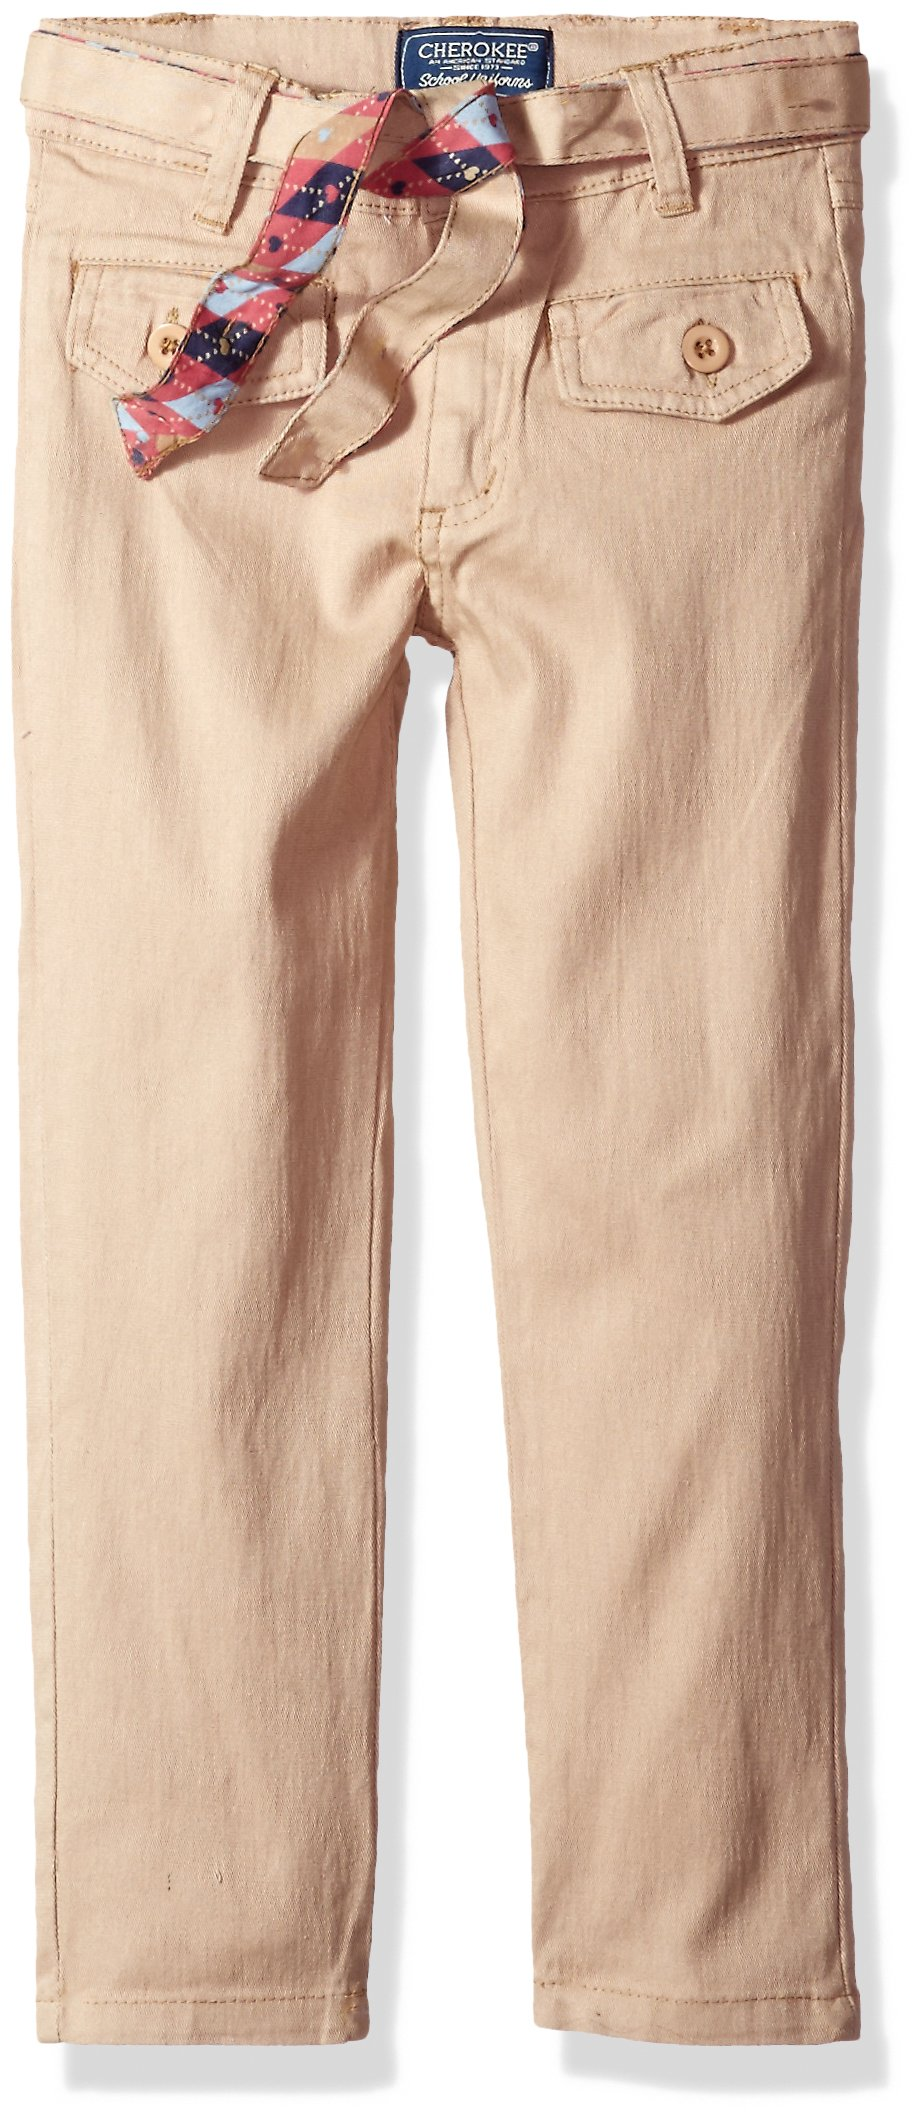 Cherokee Big Girls' Uniform Stretch Twill Pant with Belt and Flap Pocket, Khaki, 7